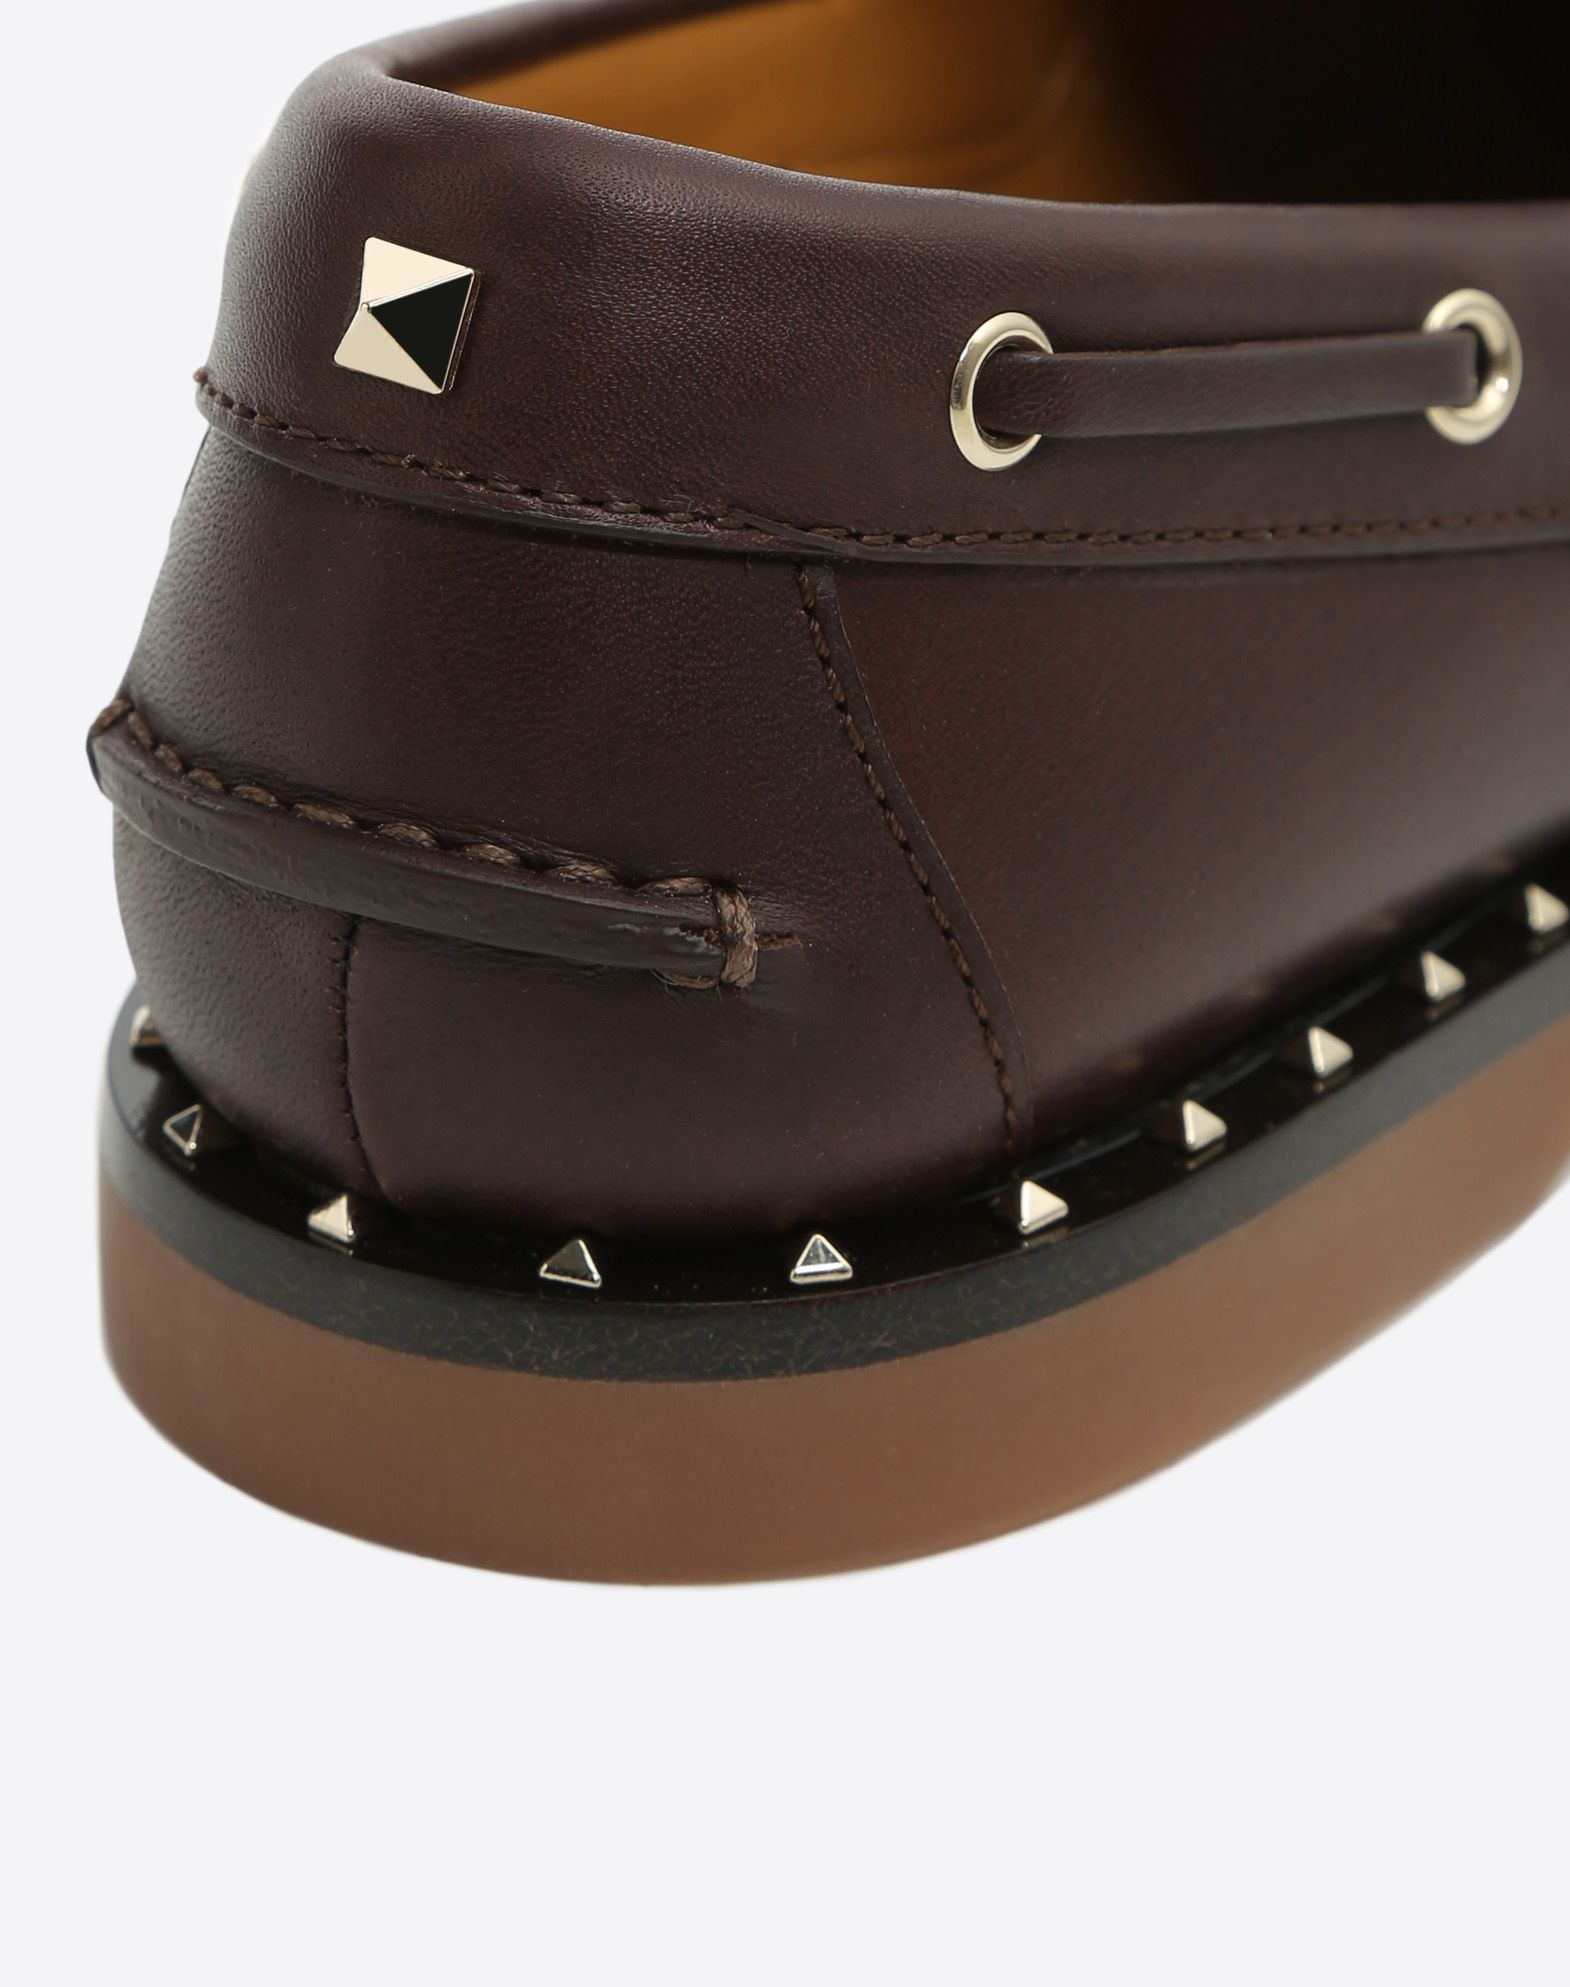 VALENTINO GARAVANI UOMO Soul Rockstud Boat shoes LOAFERS U b